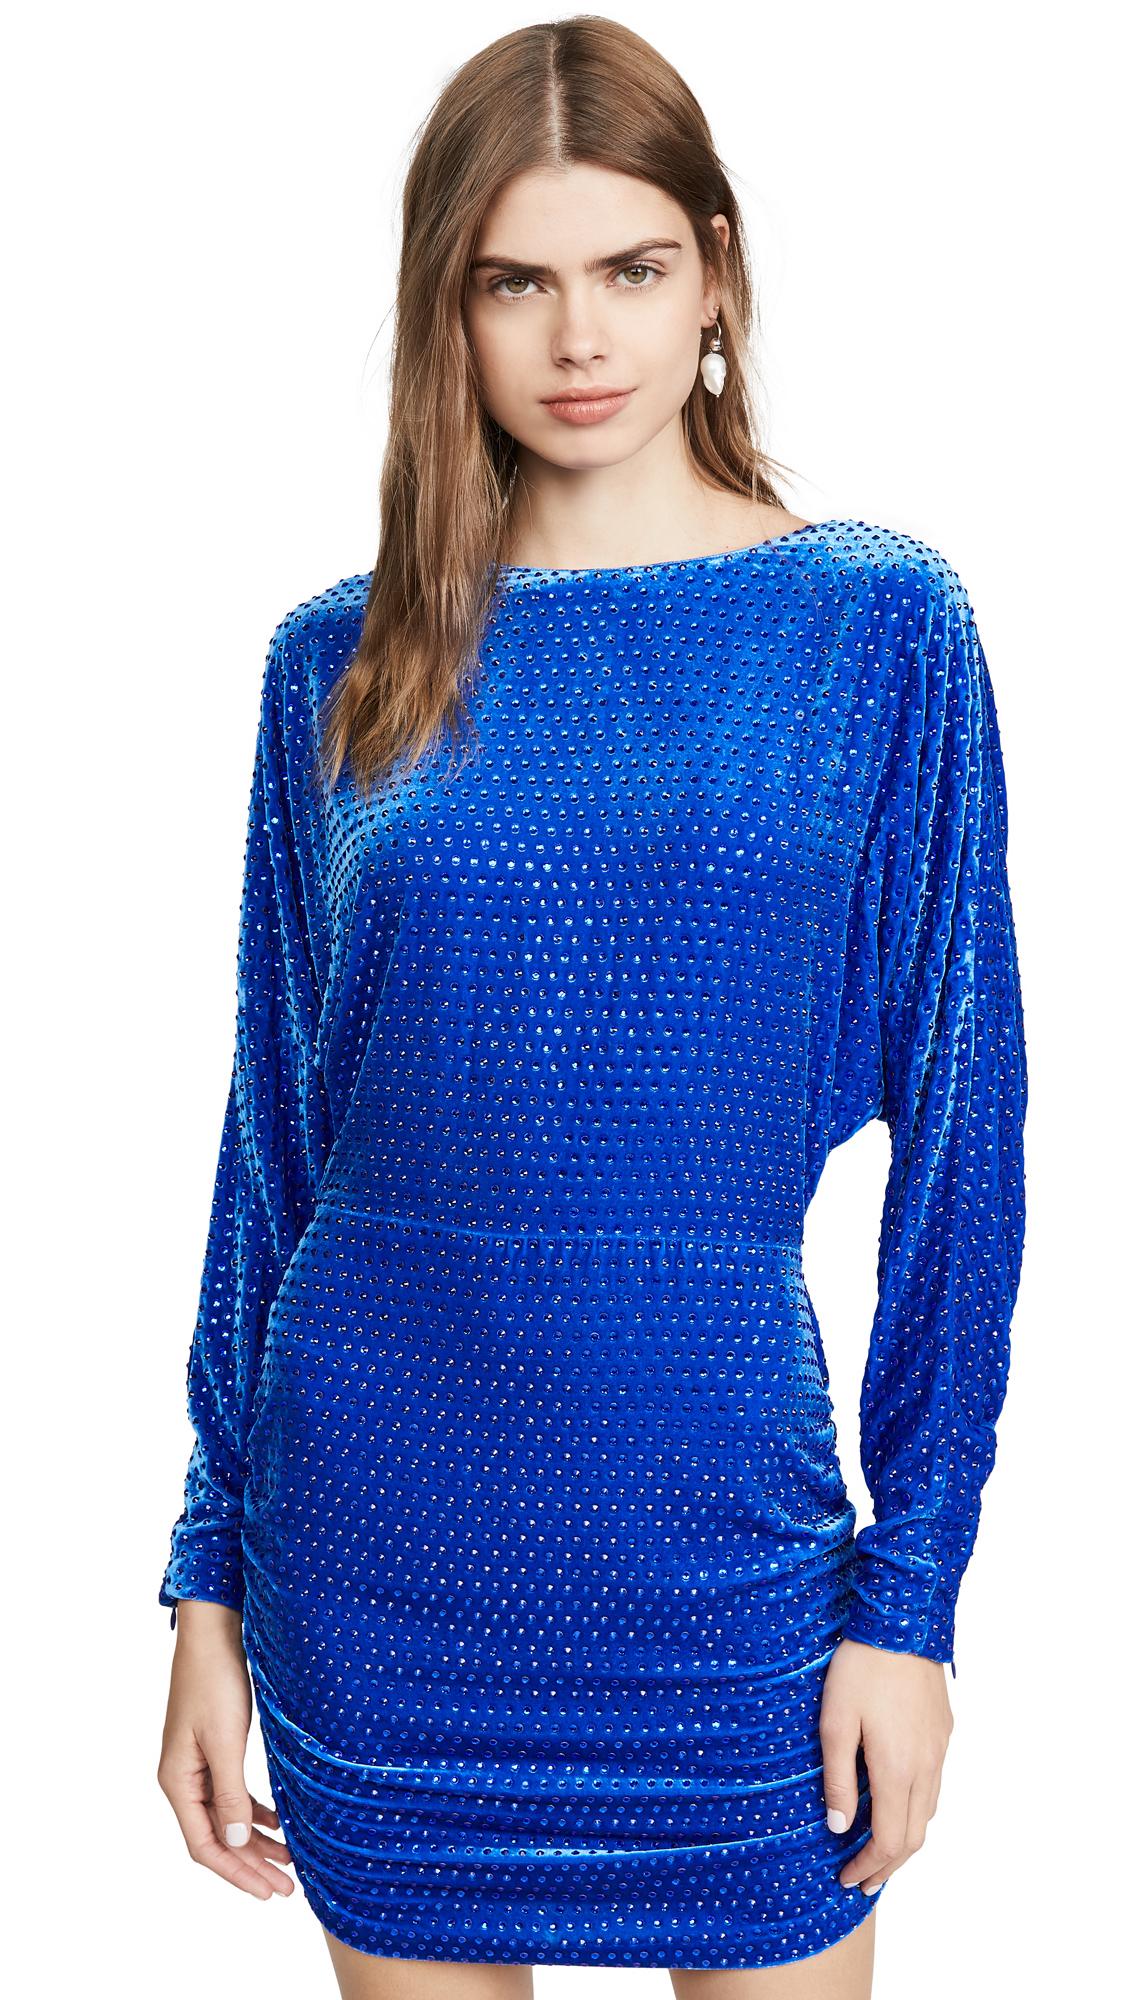 Retrofete Etta Dress - 60% Off Sale